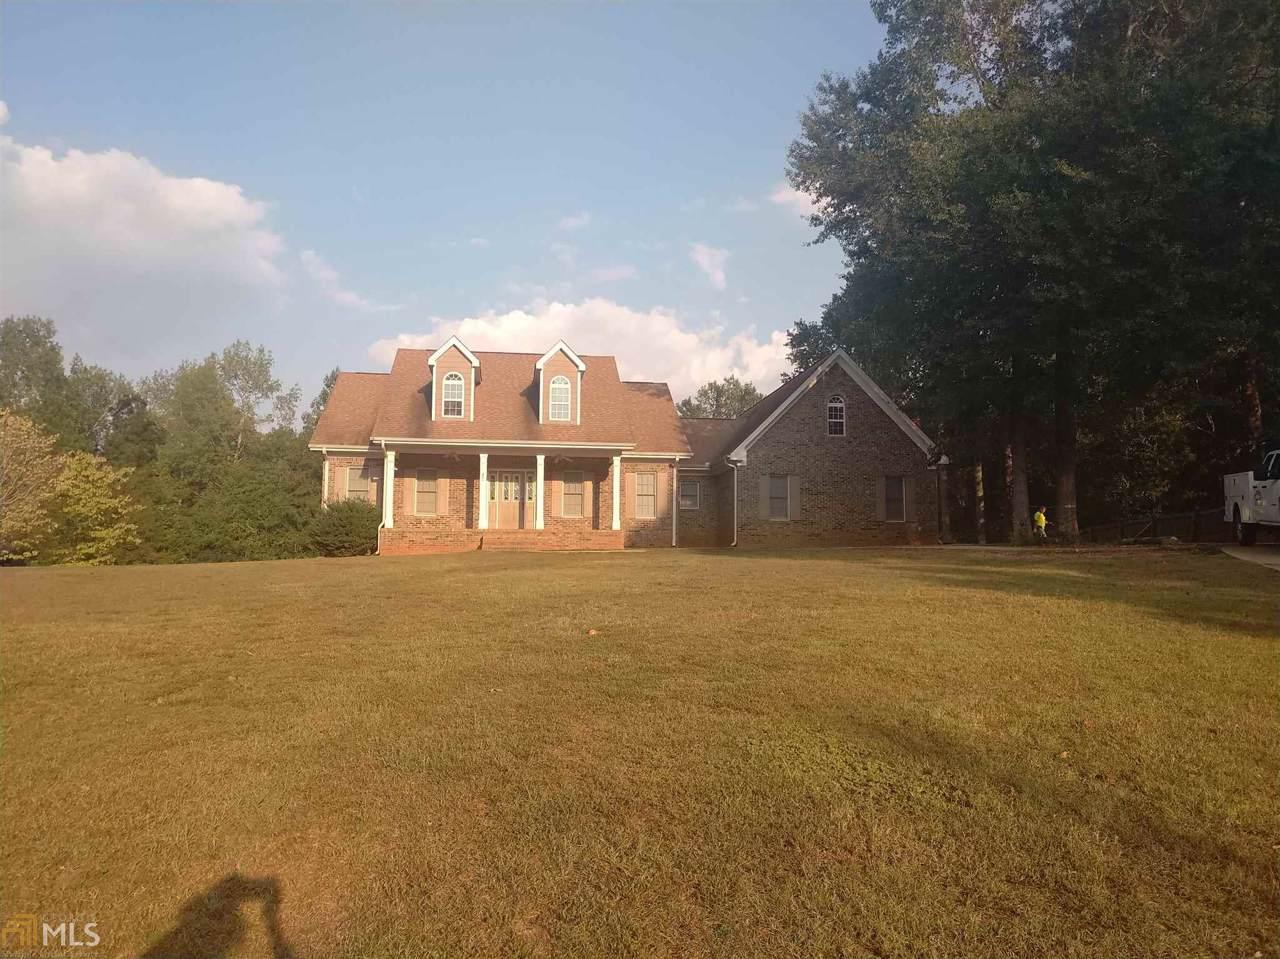 661 Oak Grove Rd - Photo 1